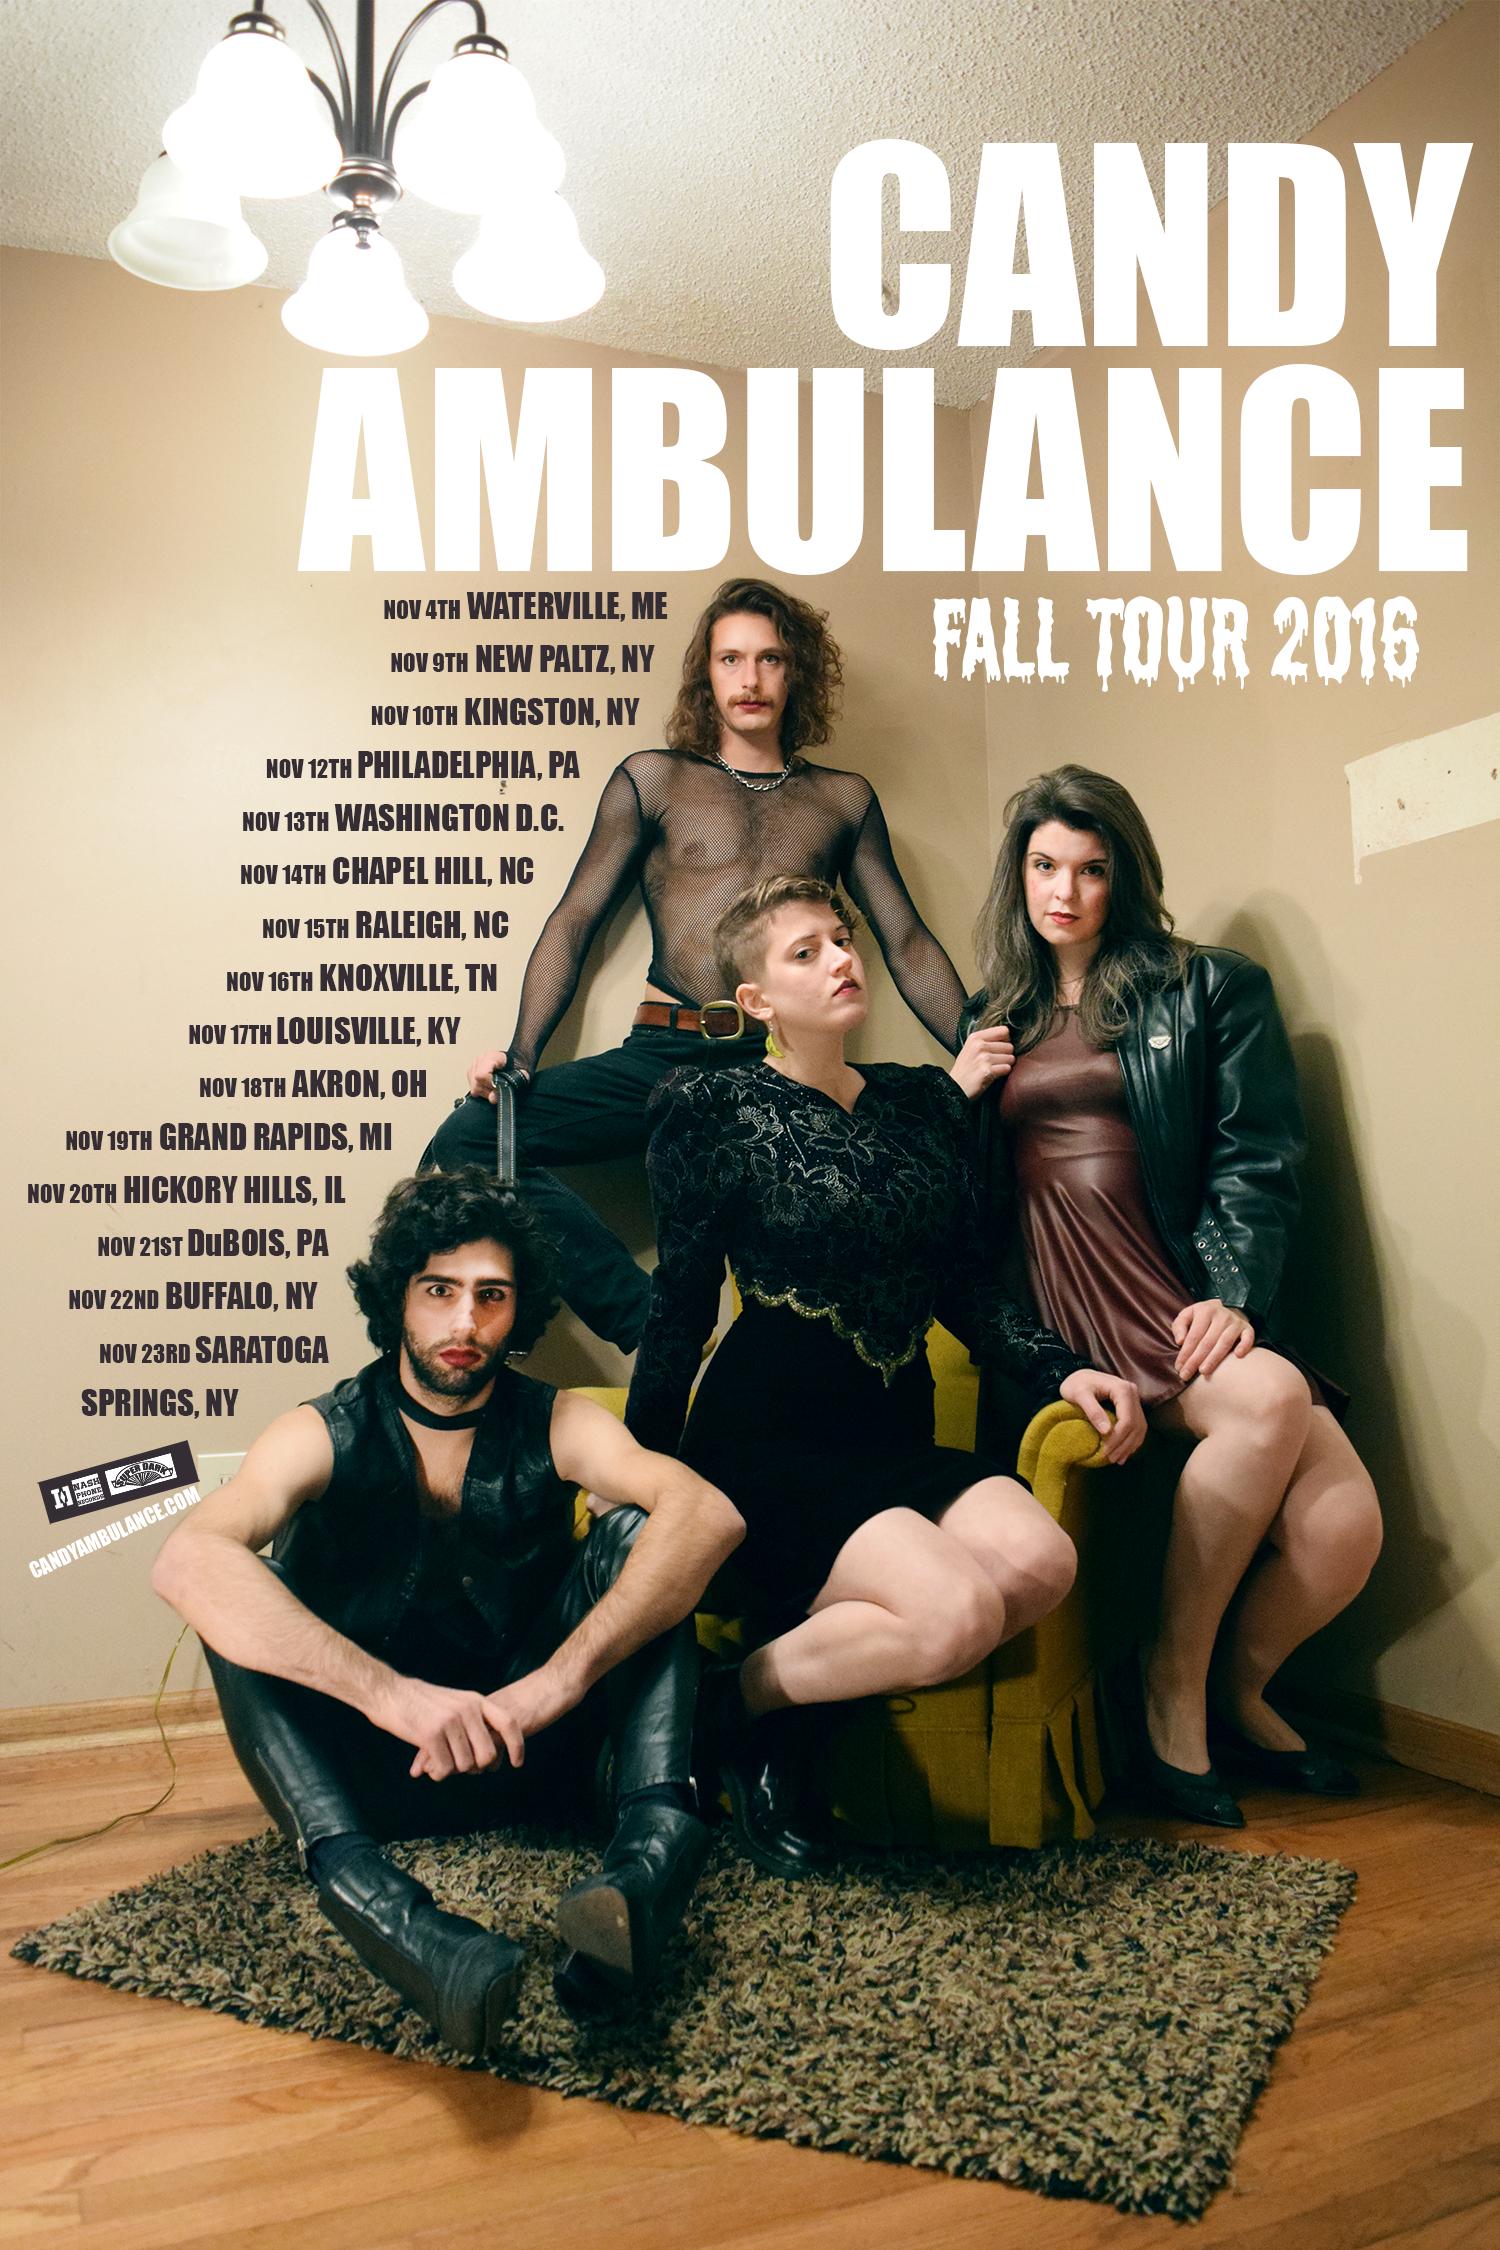 FALL TOUR 2016